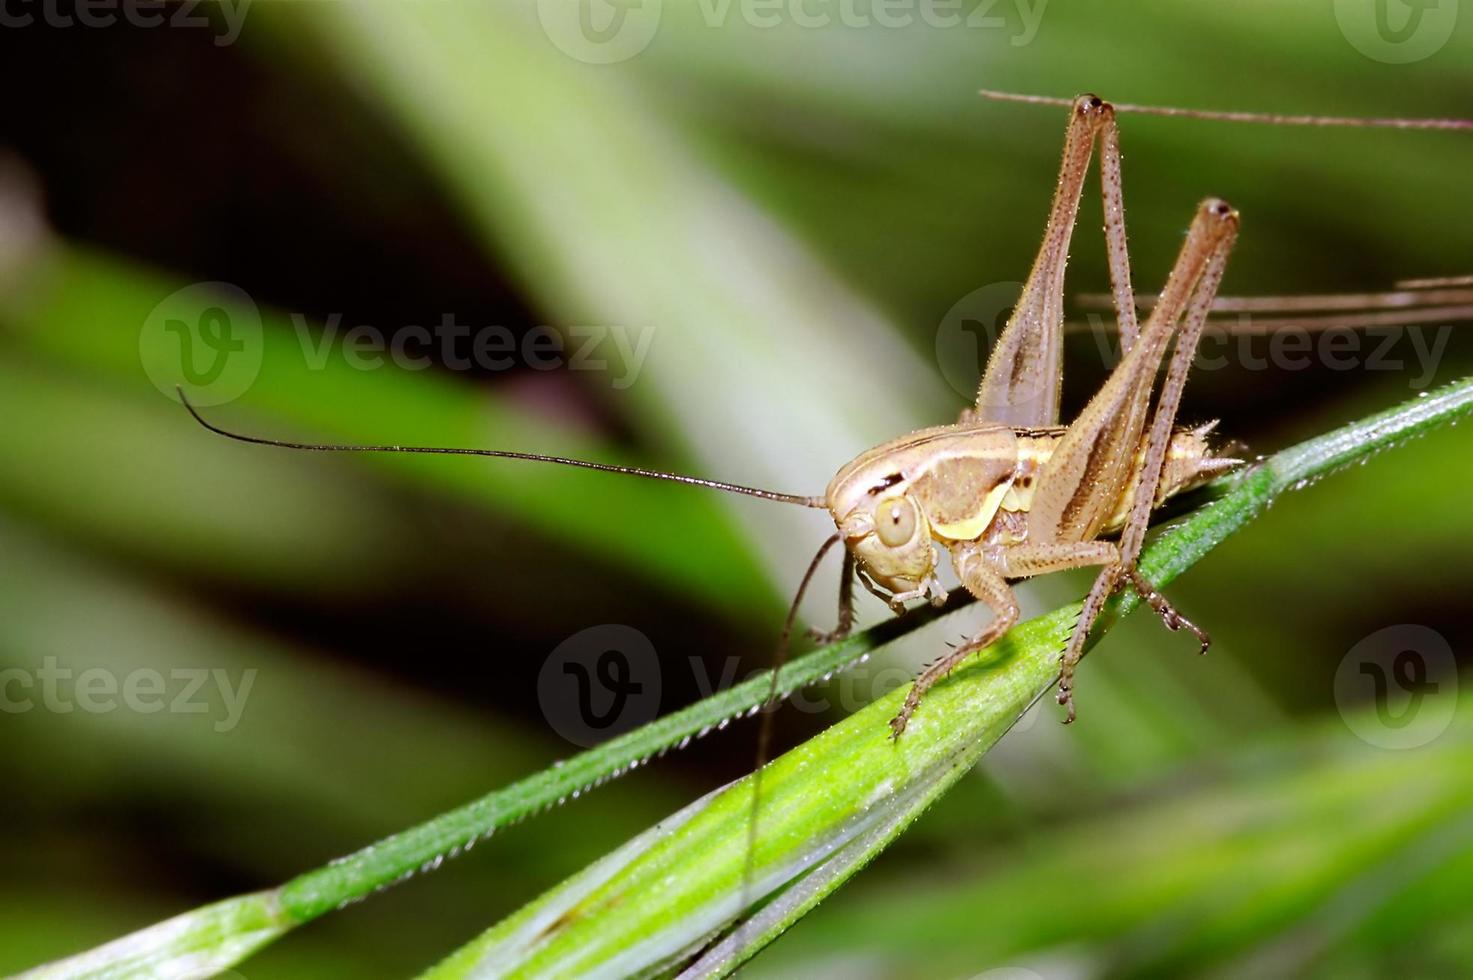 cricket joven del arbusto foto